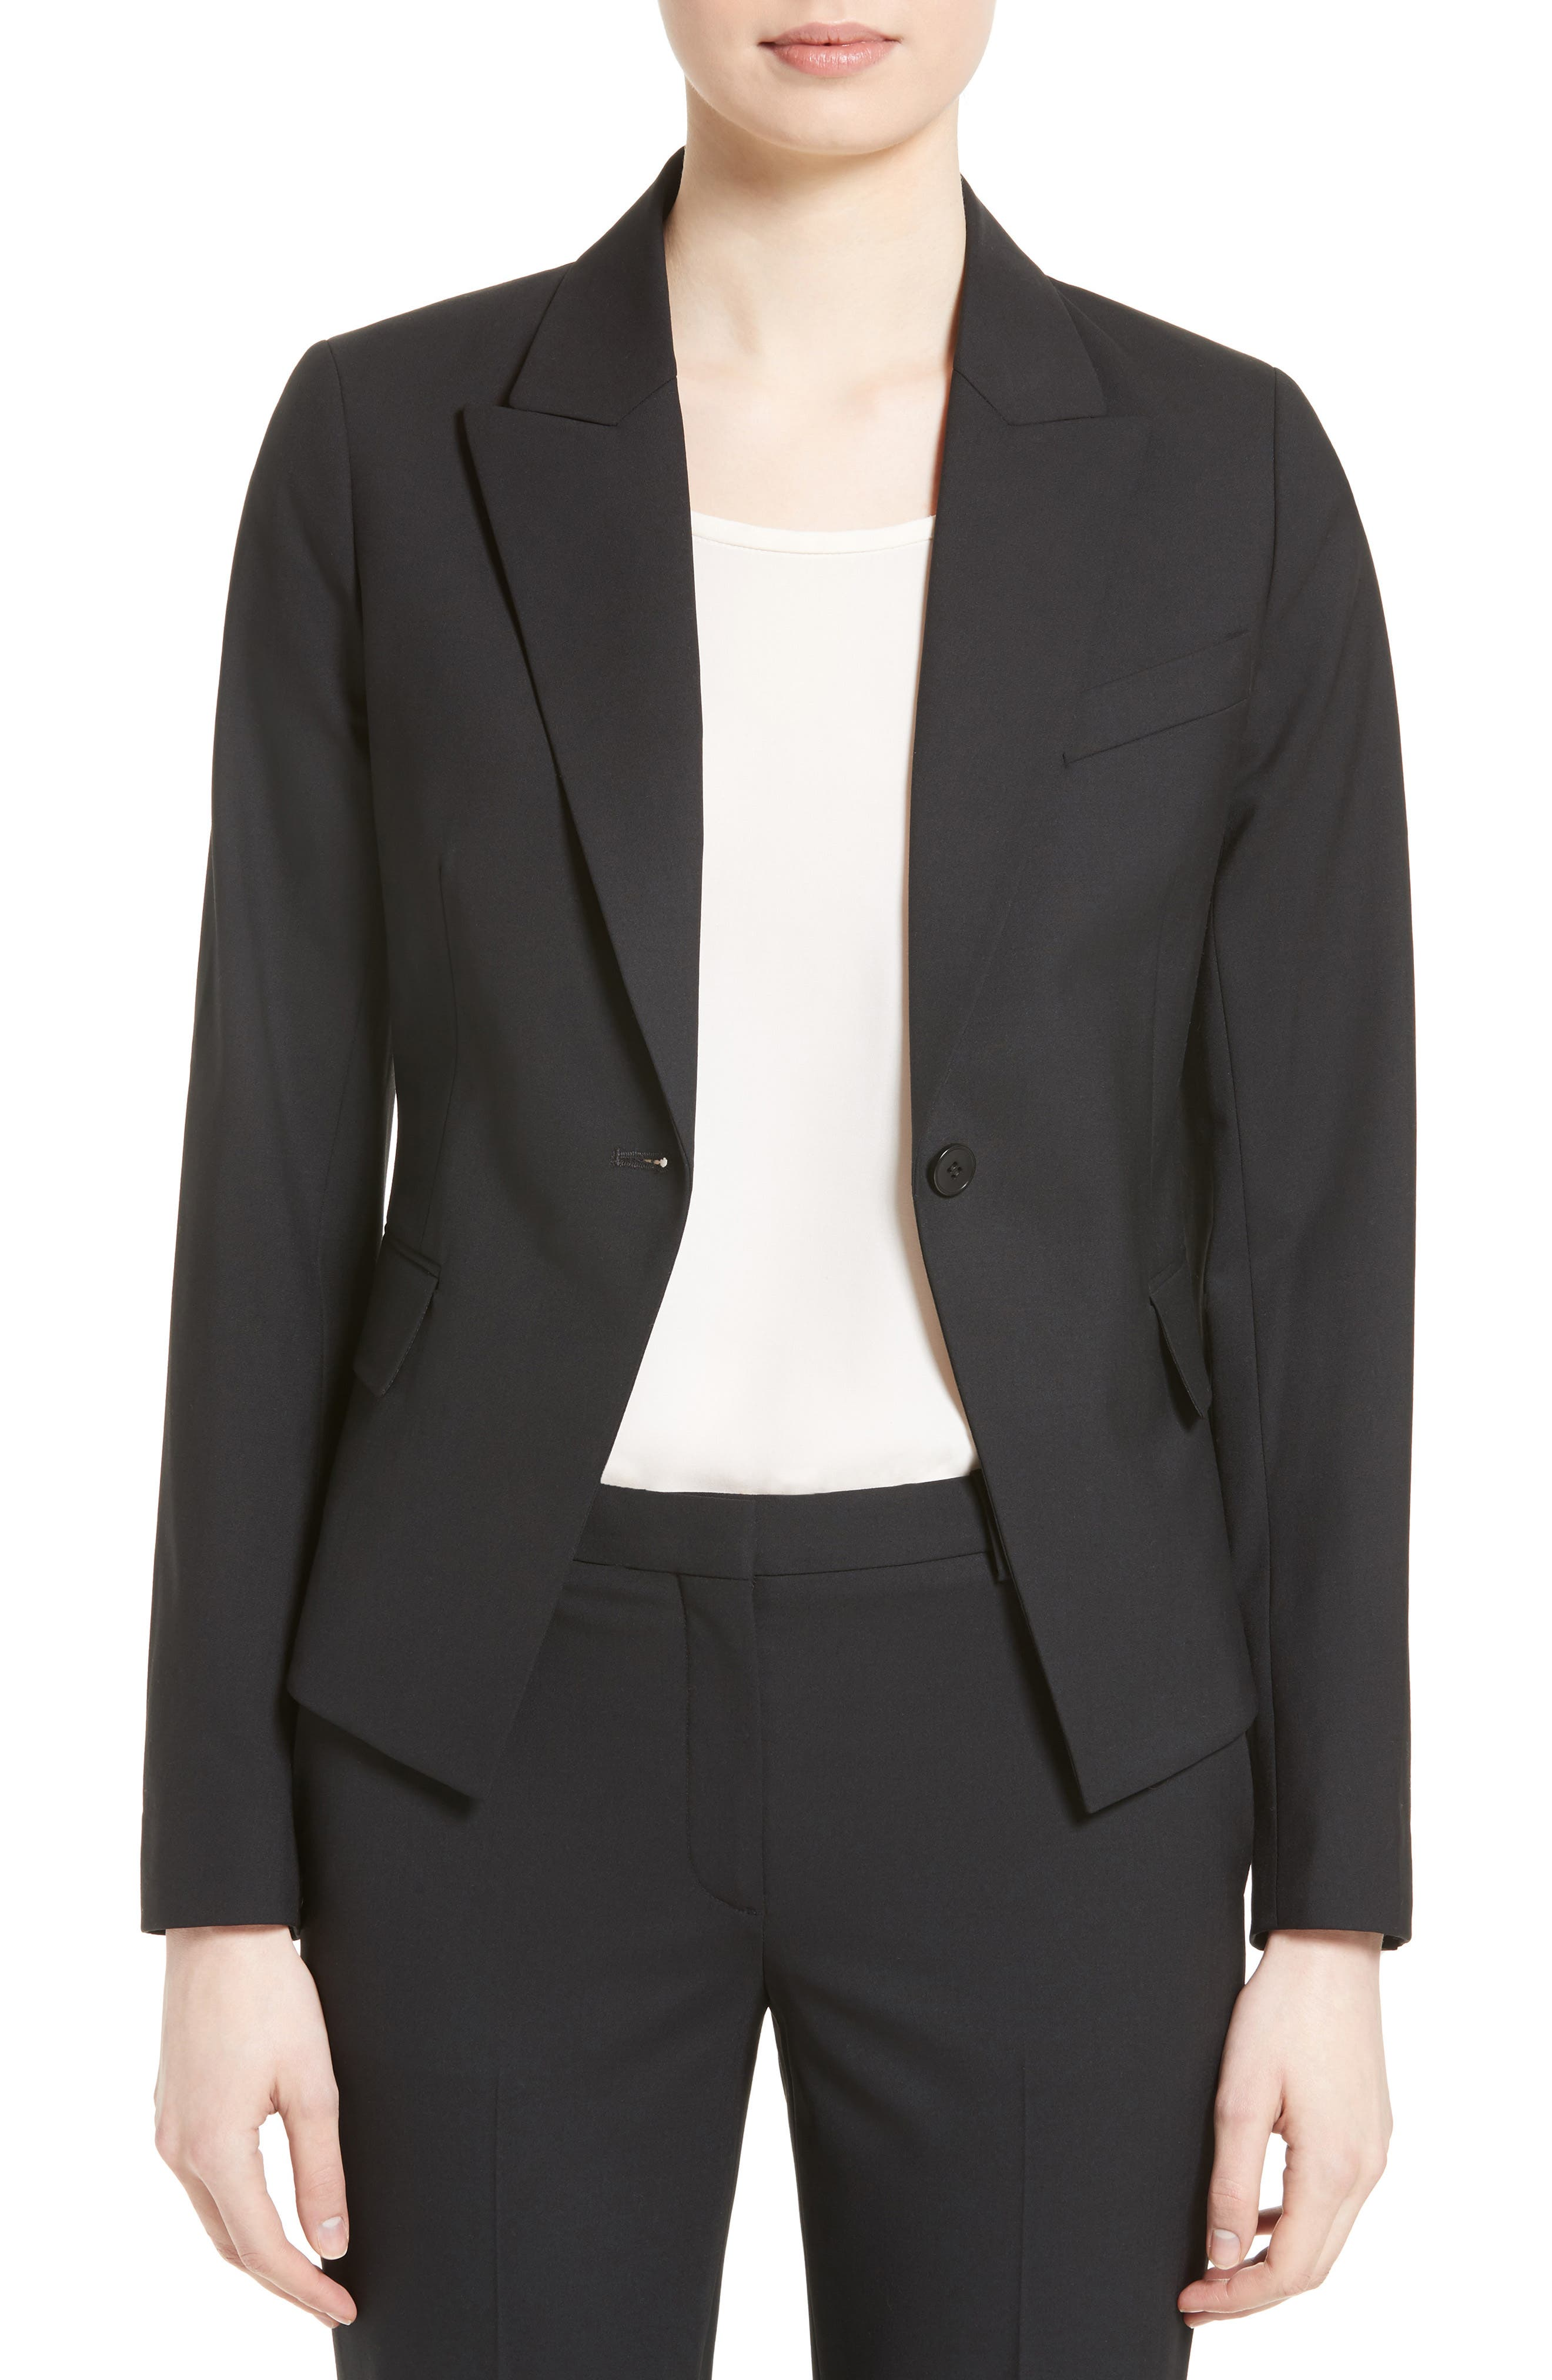 THEORY, Brince B Good Wool Suit Jacket, Main thumbnail 1, color, BLACK